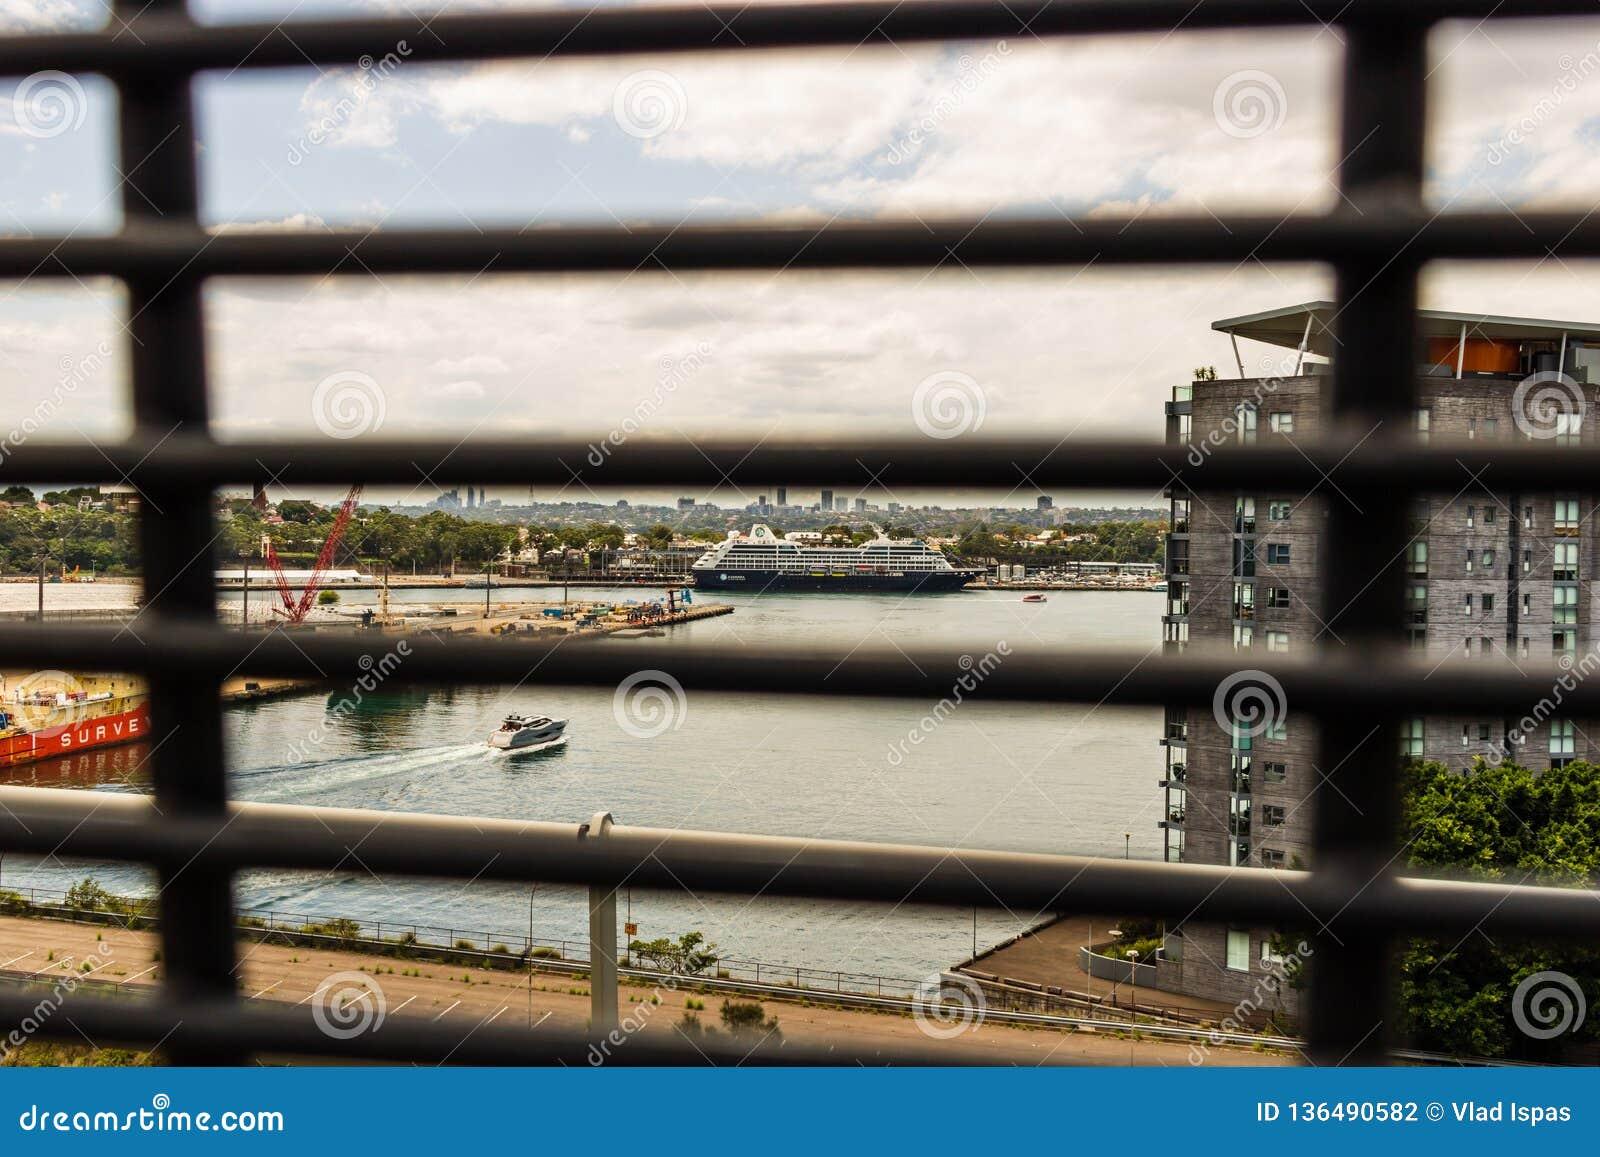 Sydney, Australia - 2019. Boutique cruise liner docked in Sydney harbor. Photo from the Anzac Bridge